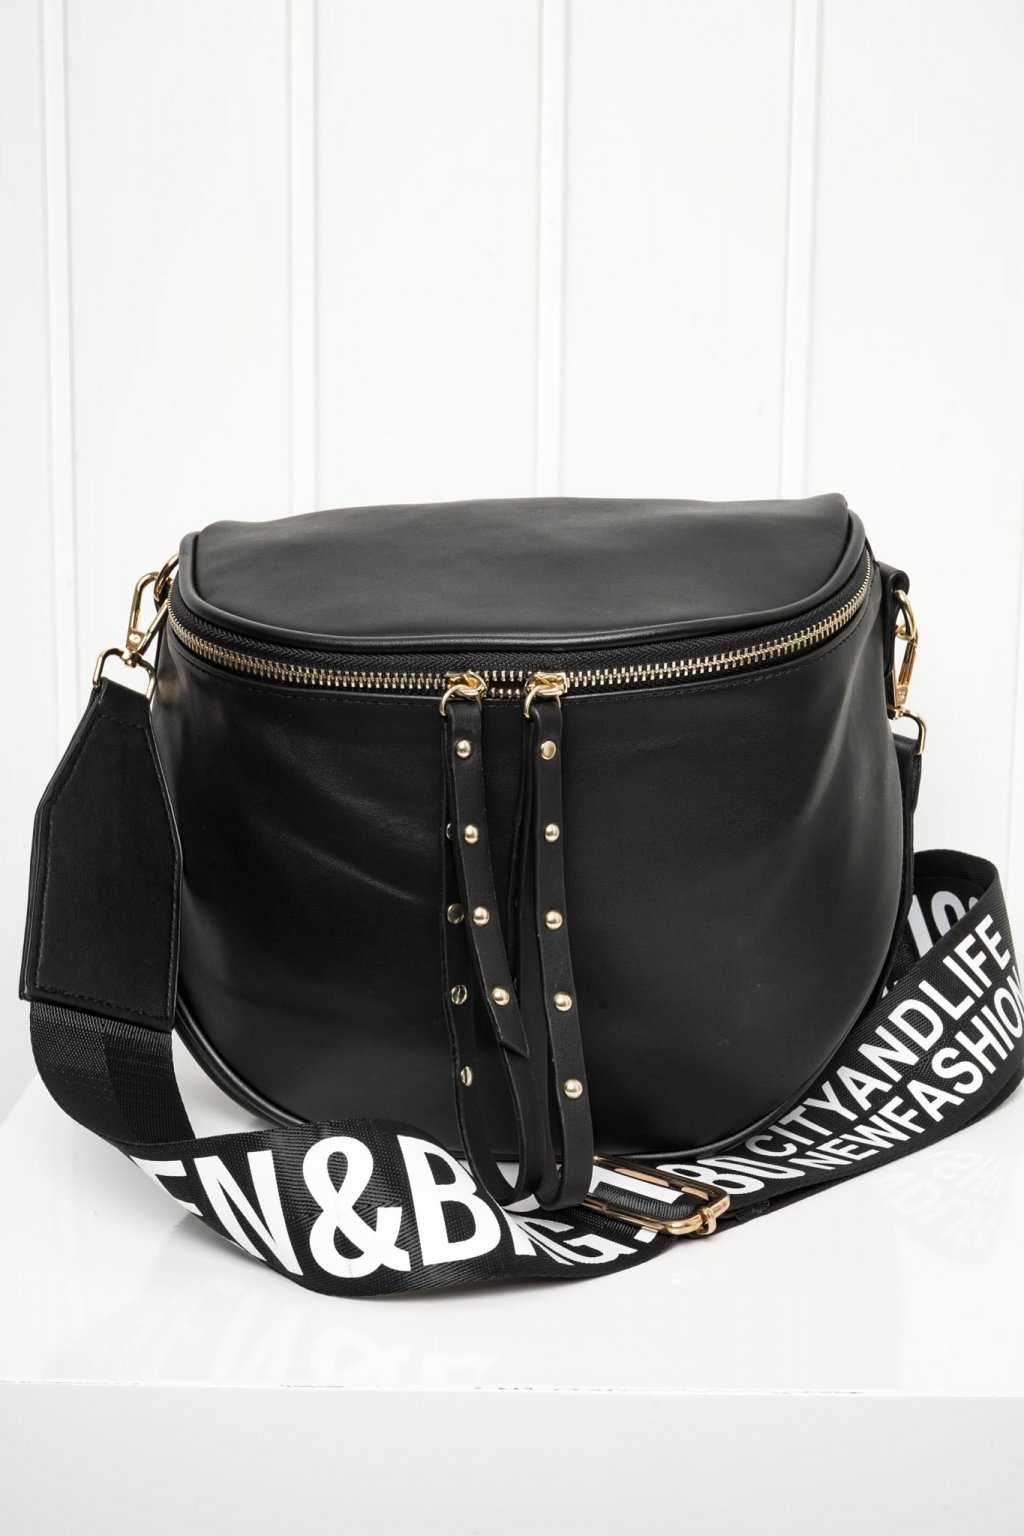 Kabelka, crossbody, ruksak, shopping bag, shopperka, 287